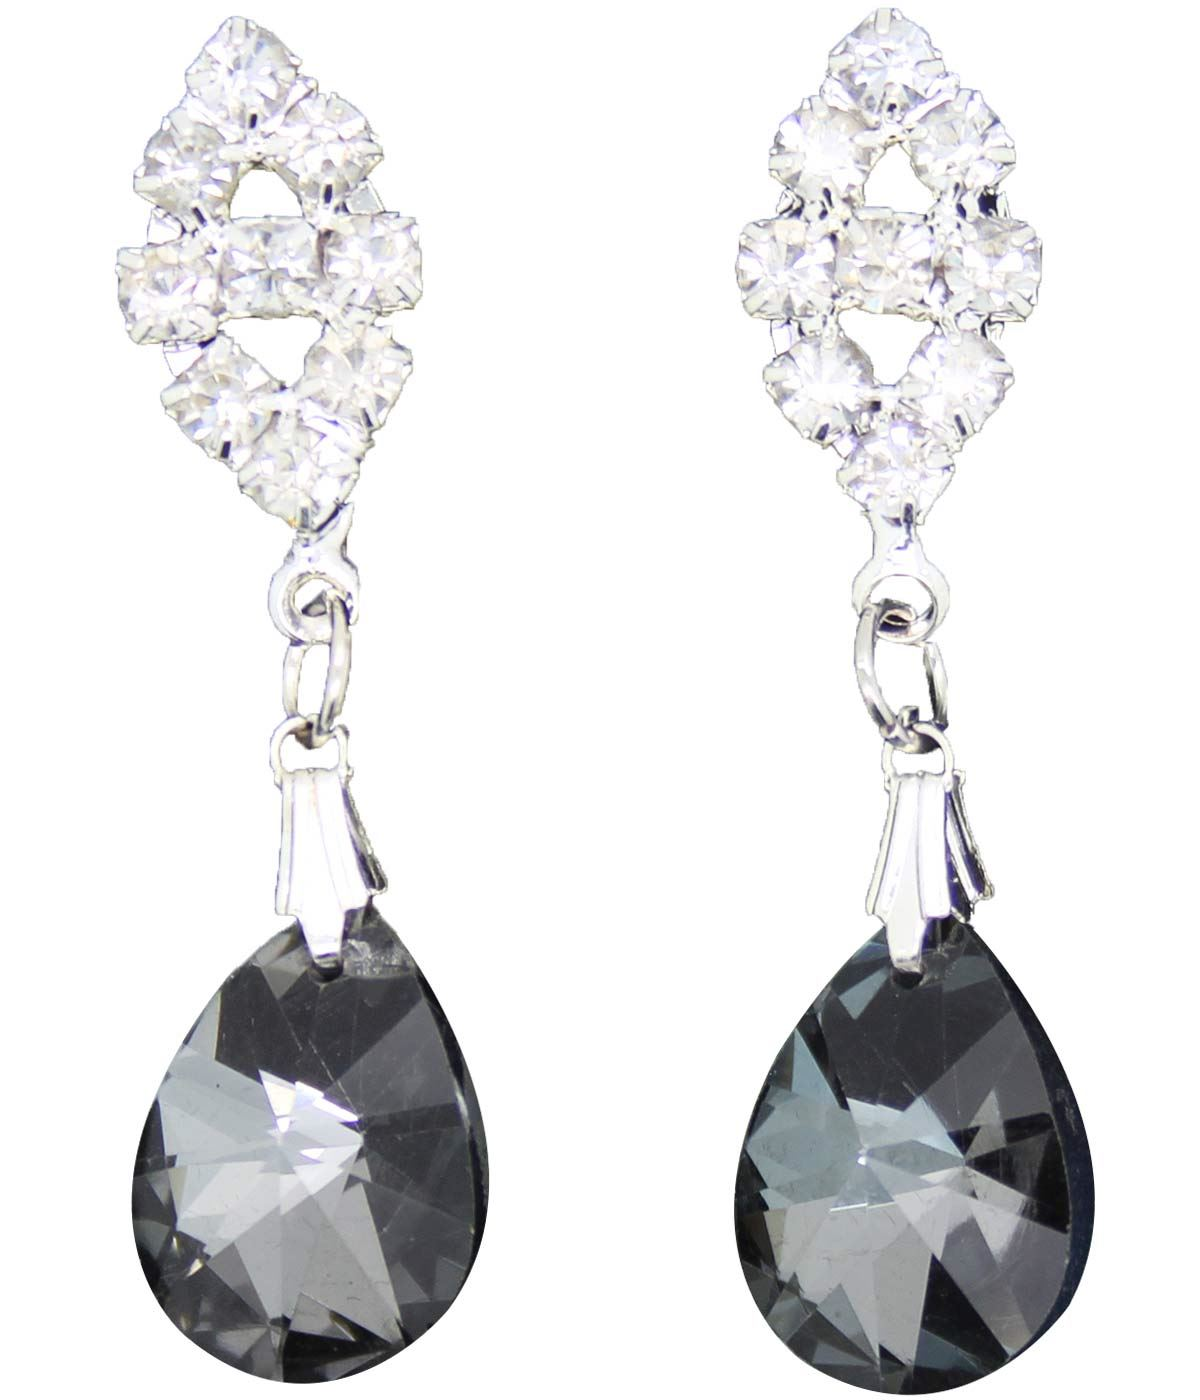 True-Face-Ladies-Women-039-s-Elegant-Earrings-Necklace-Set-Metal-Alloy-Jewellery thumbnail 3